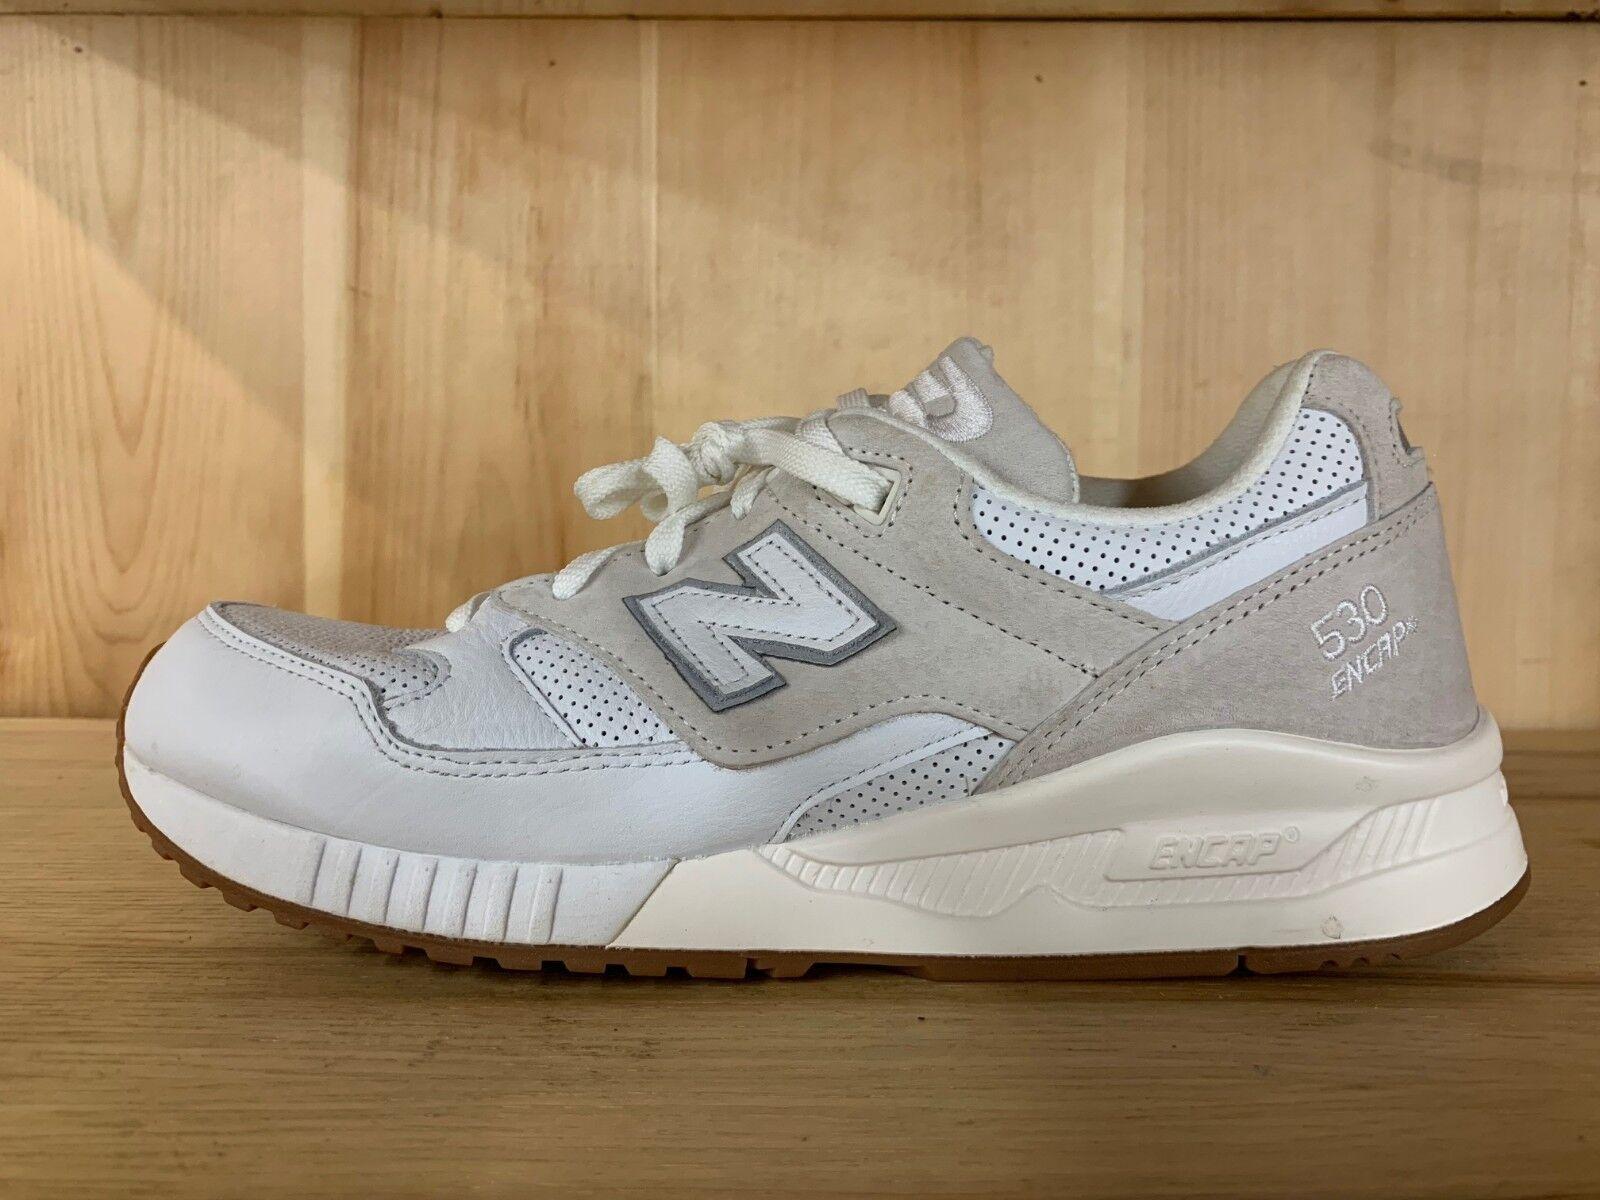 New New New balance 530 weiße, graue weißliche creme kaugummi sz 7.5-13 m530ata fe65c3